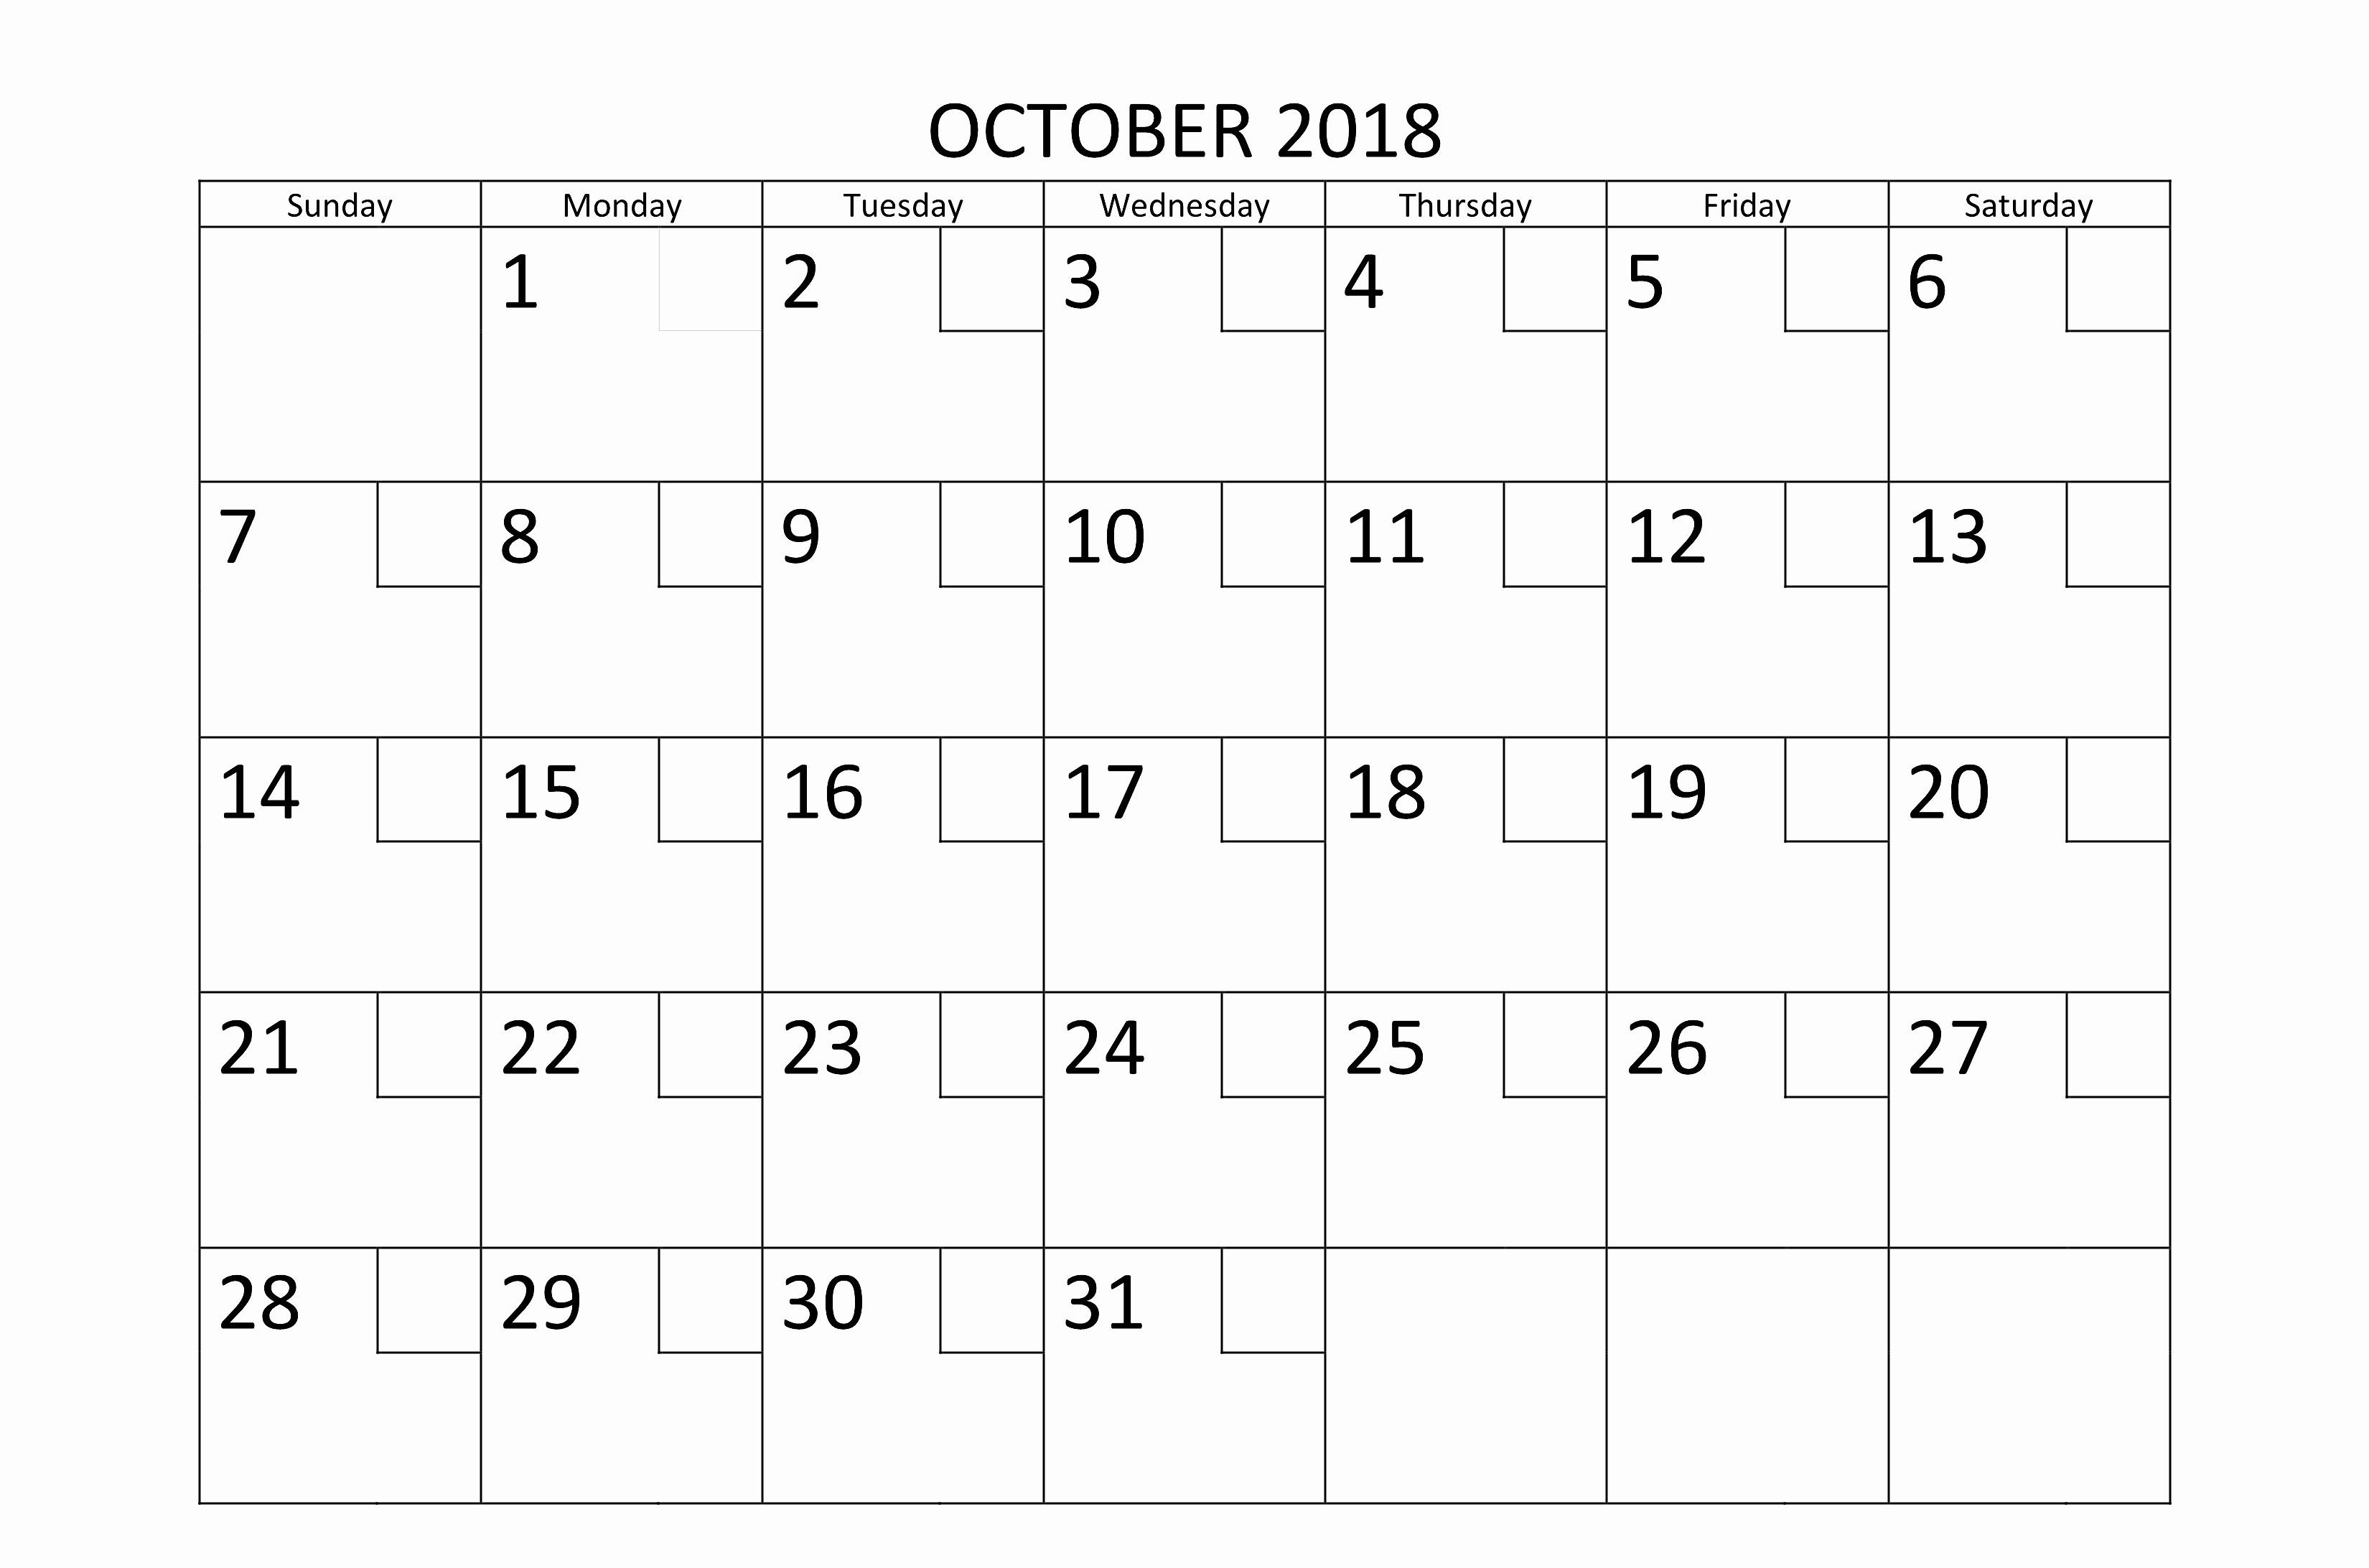 October 2018 Printable Calendar Word Beautiful October Calendar for 2018 Word Printable Letter Template